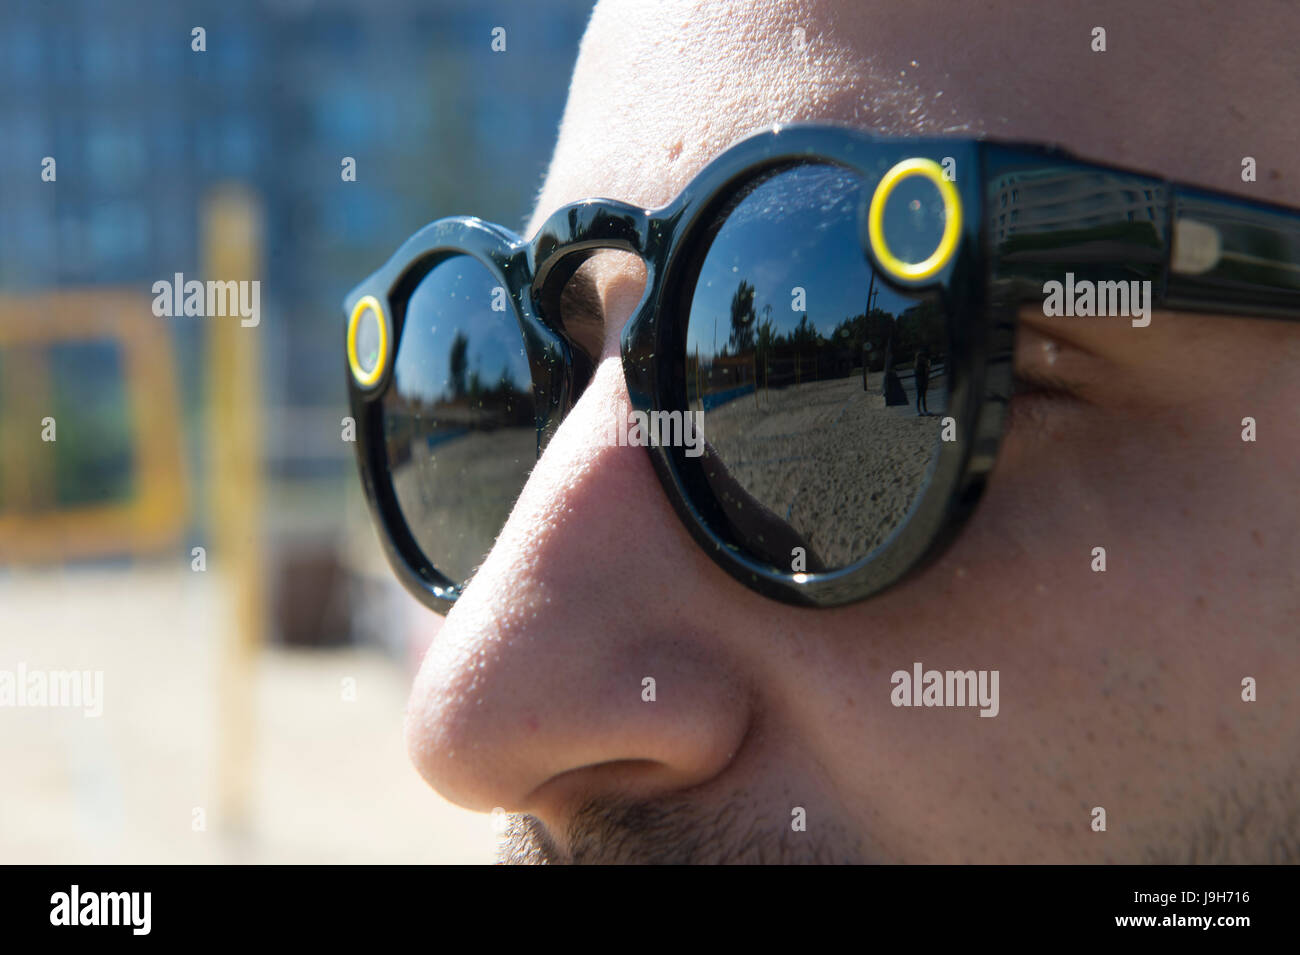 Photo Vending Stockfotos & Photo Vending Bilder - Seite 2 - Alamy